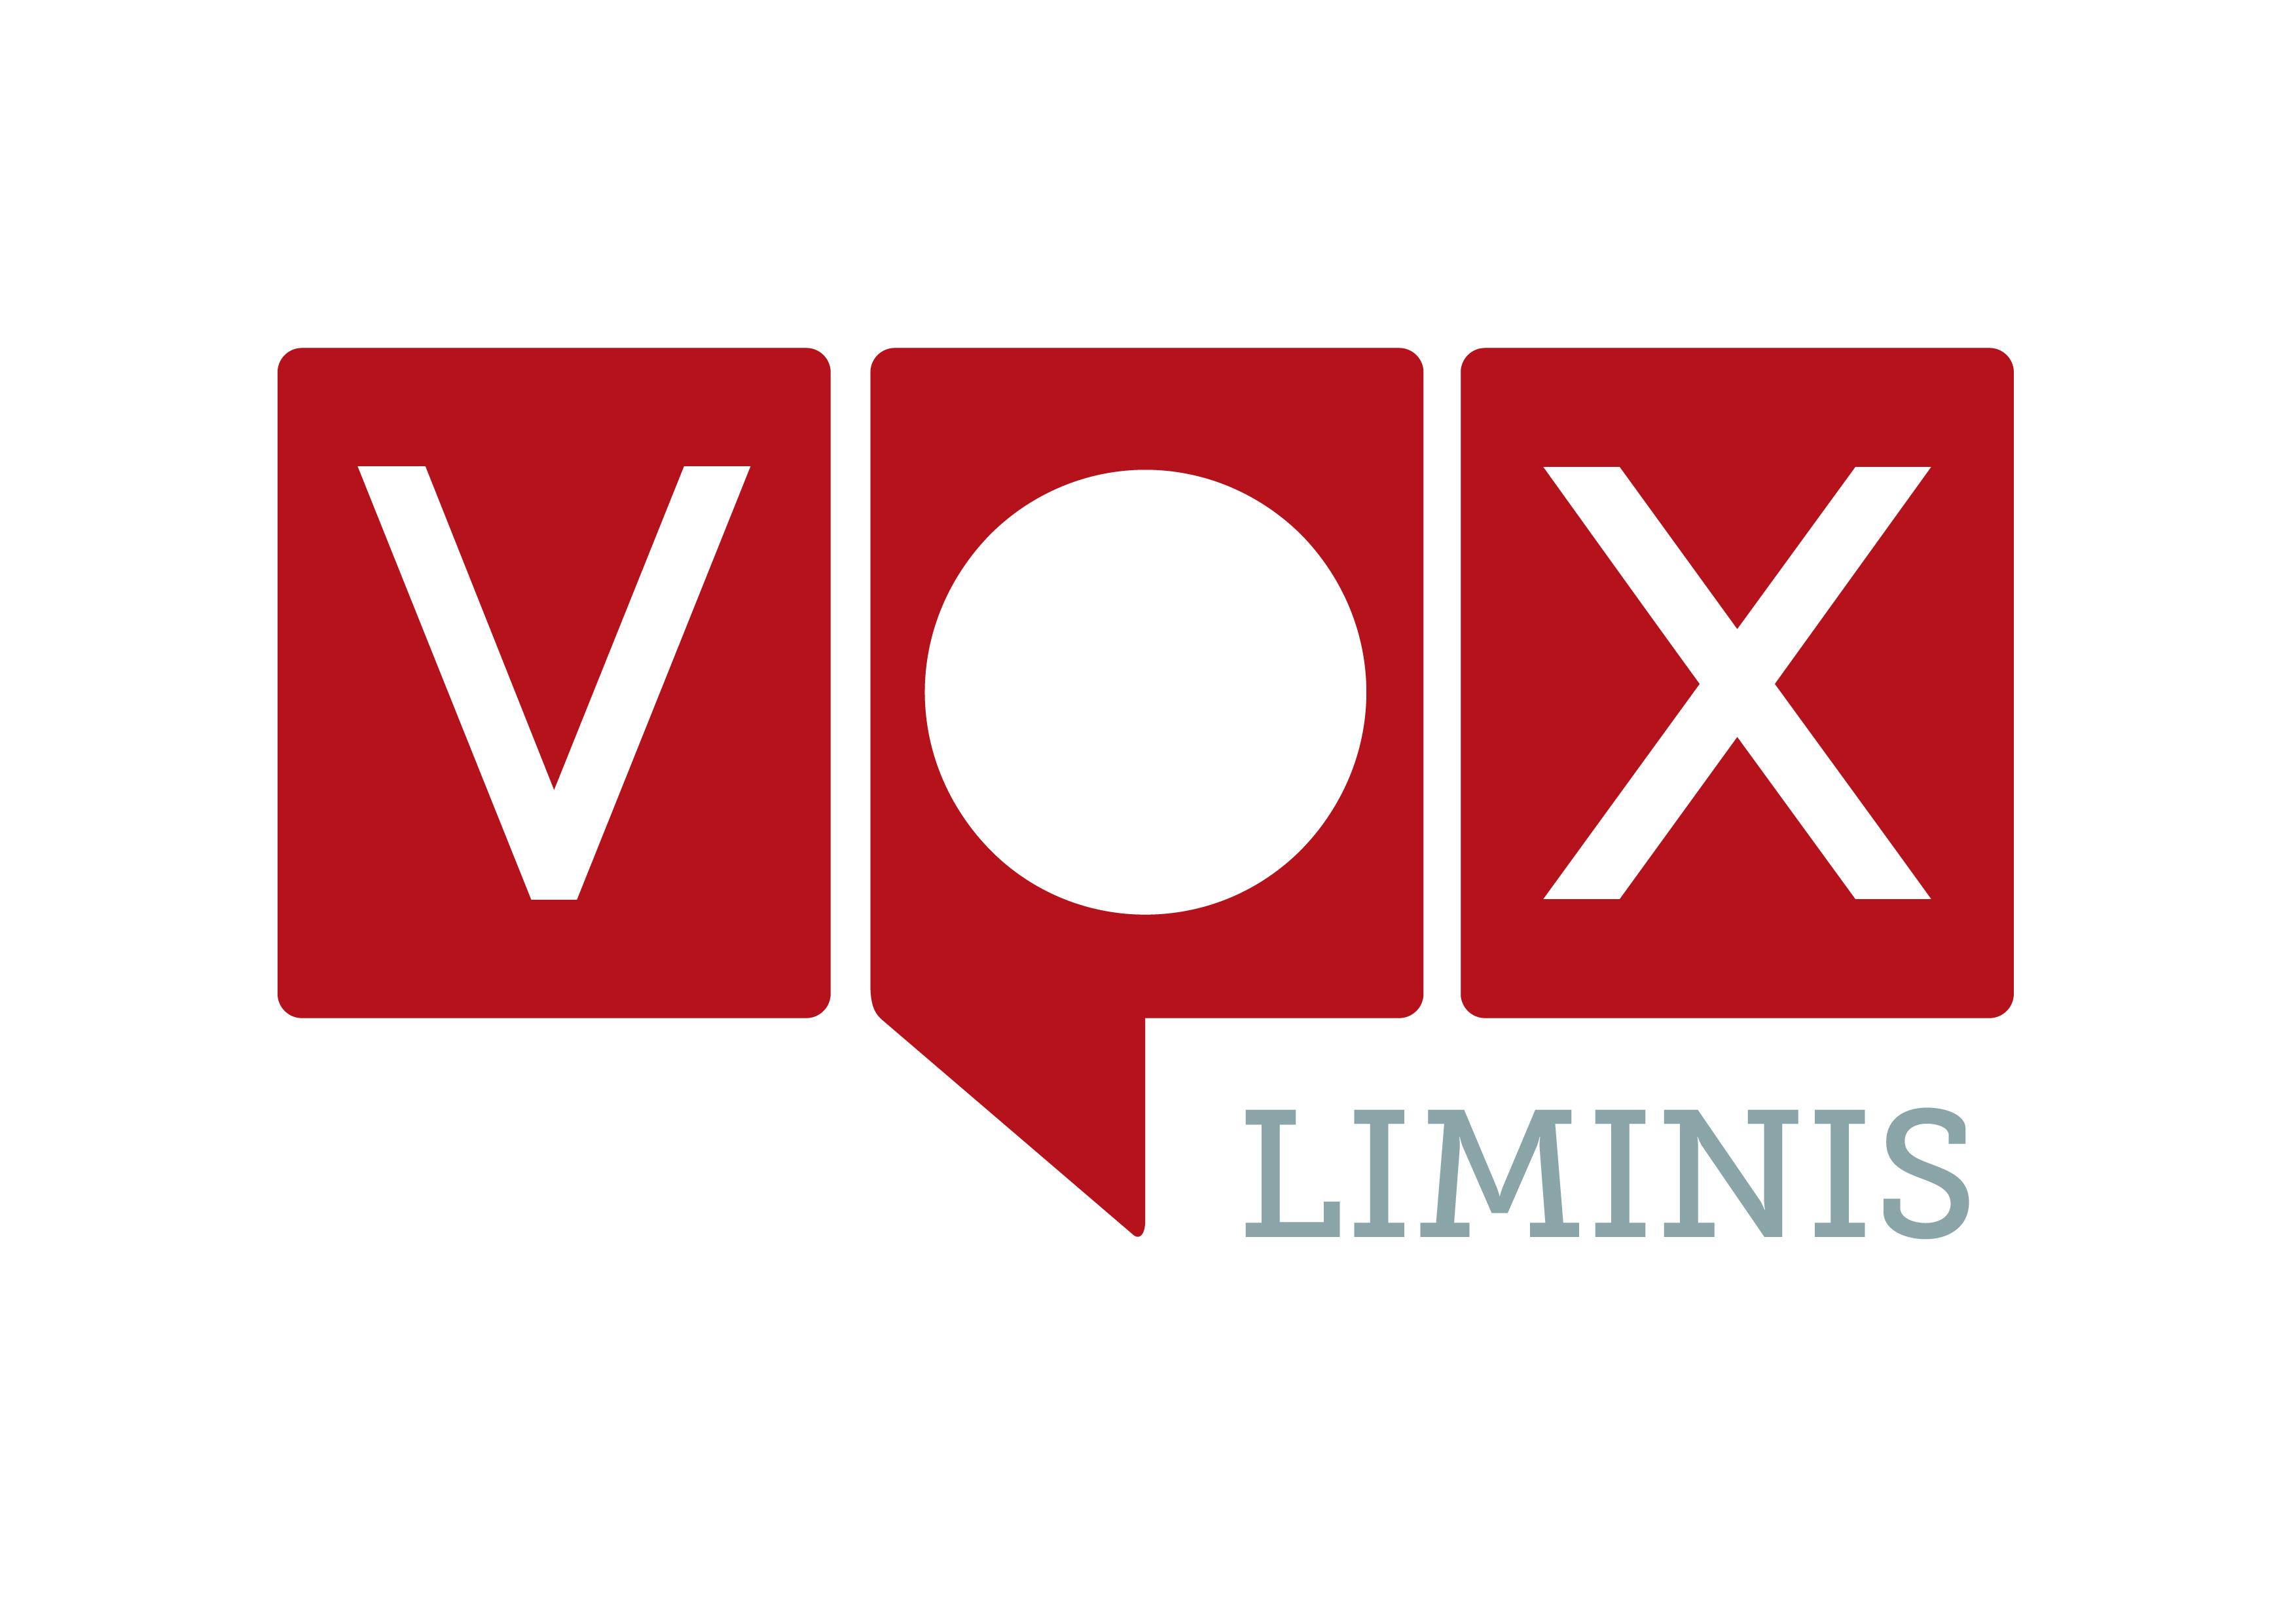 VOX_Logo_Combo1.jpeg